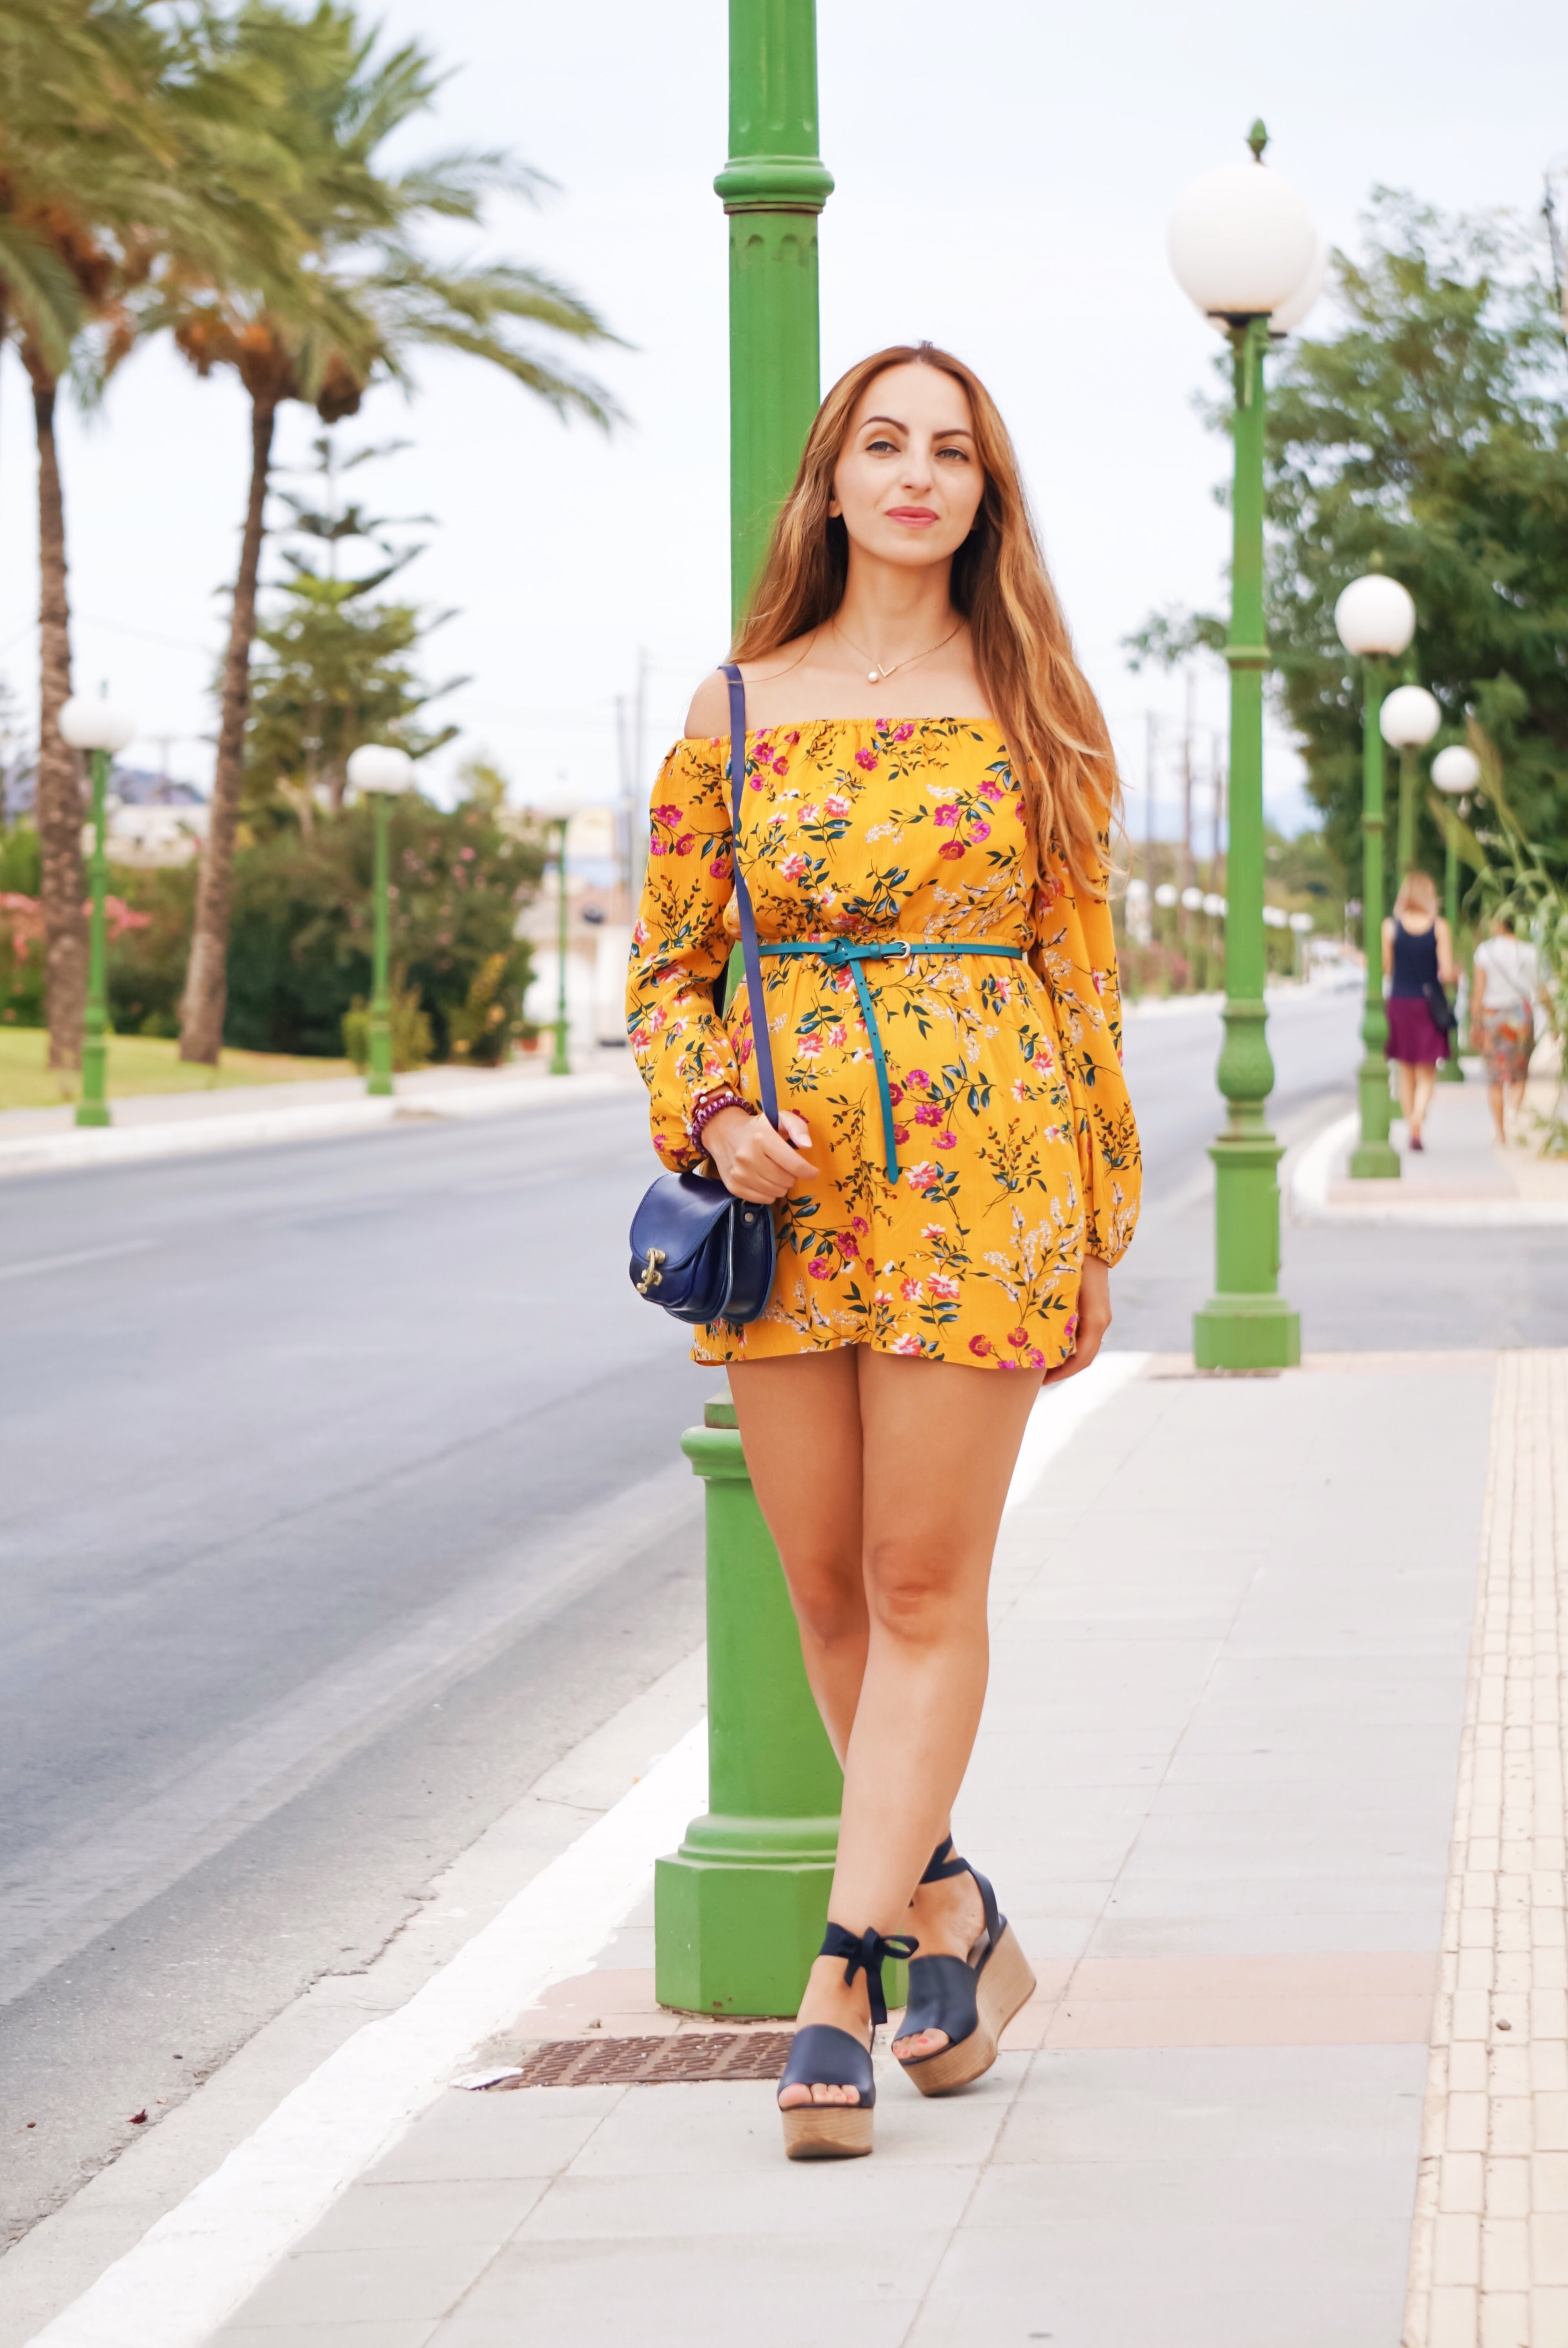 Chania-Crete-Fashionblogger-Outfit-Post-10